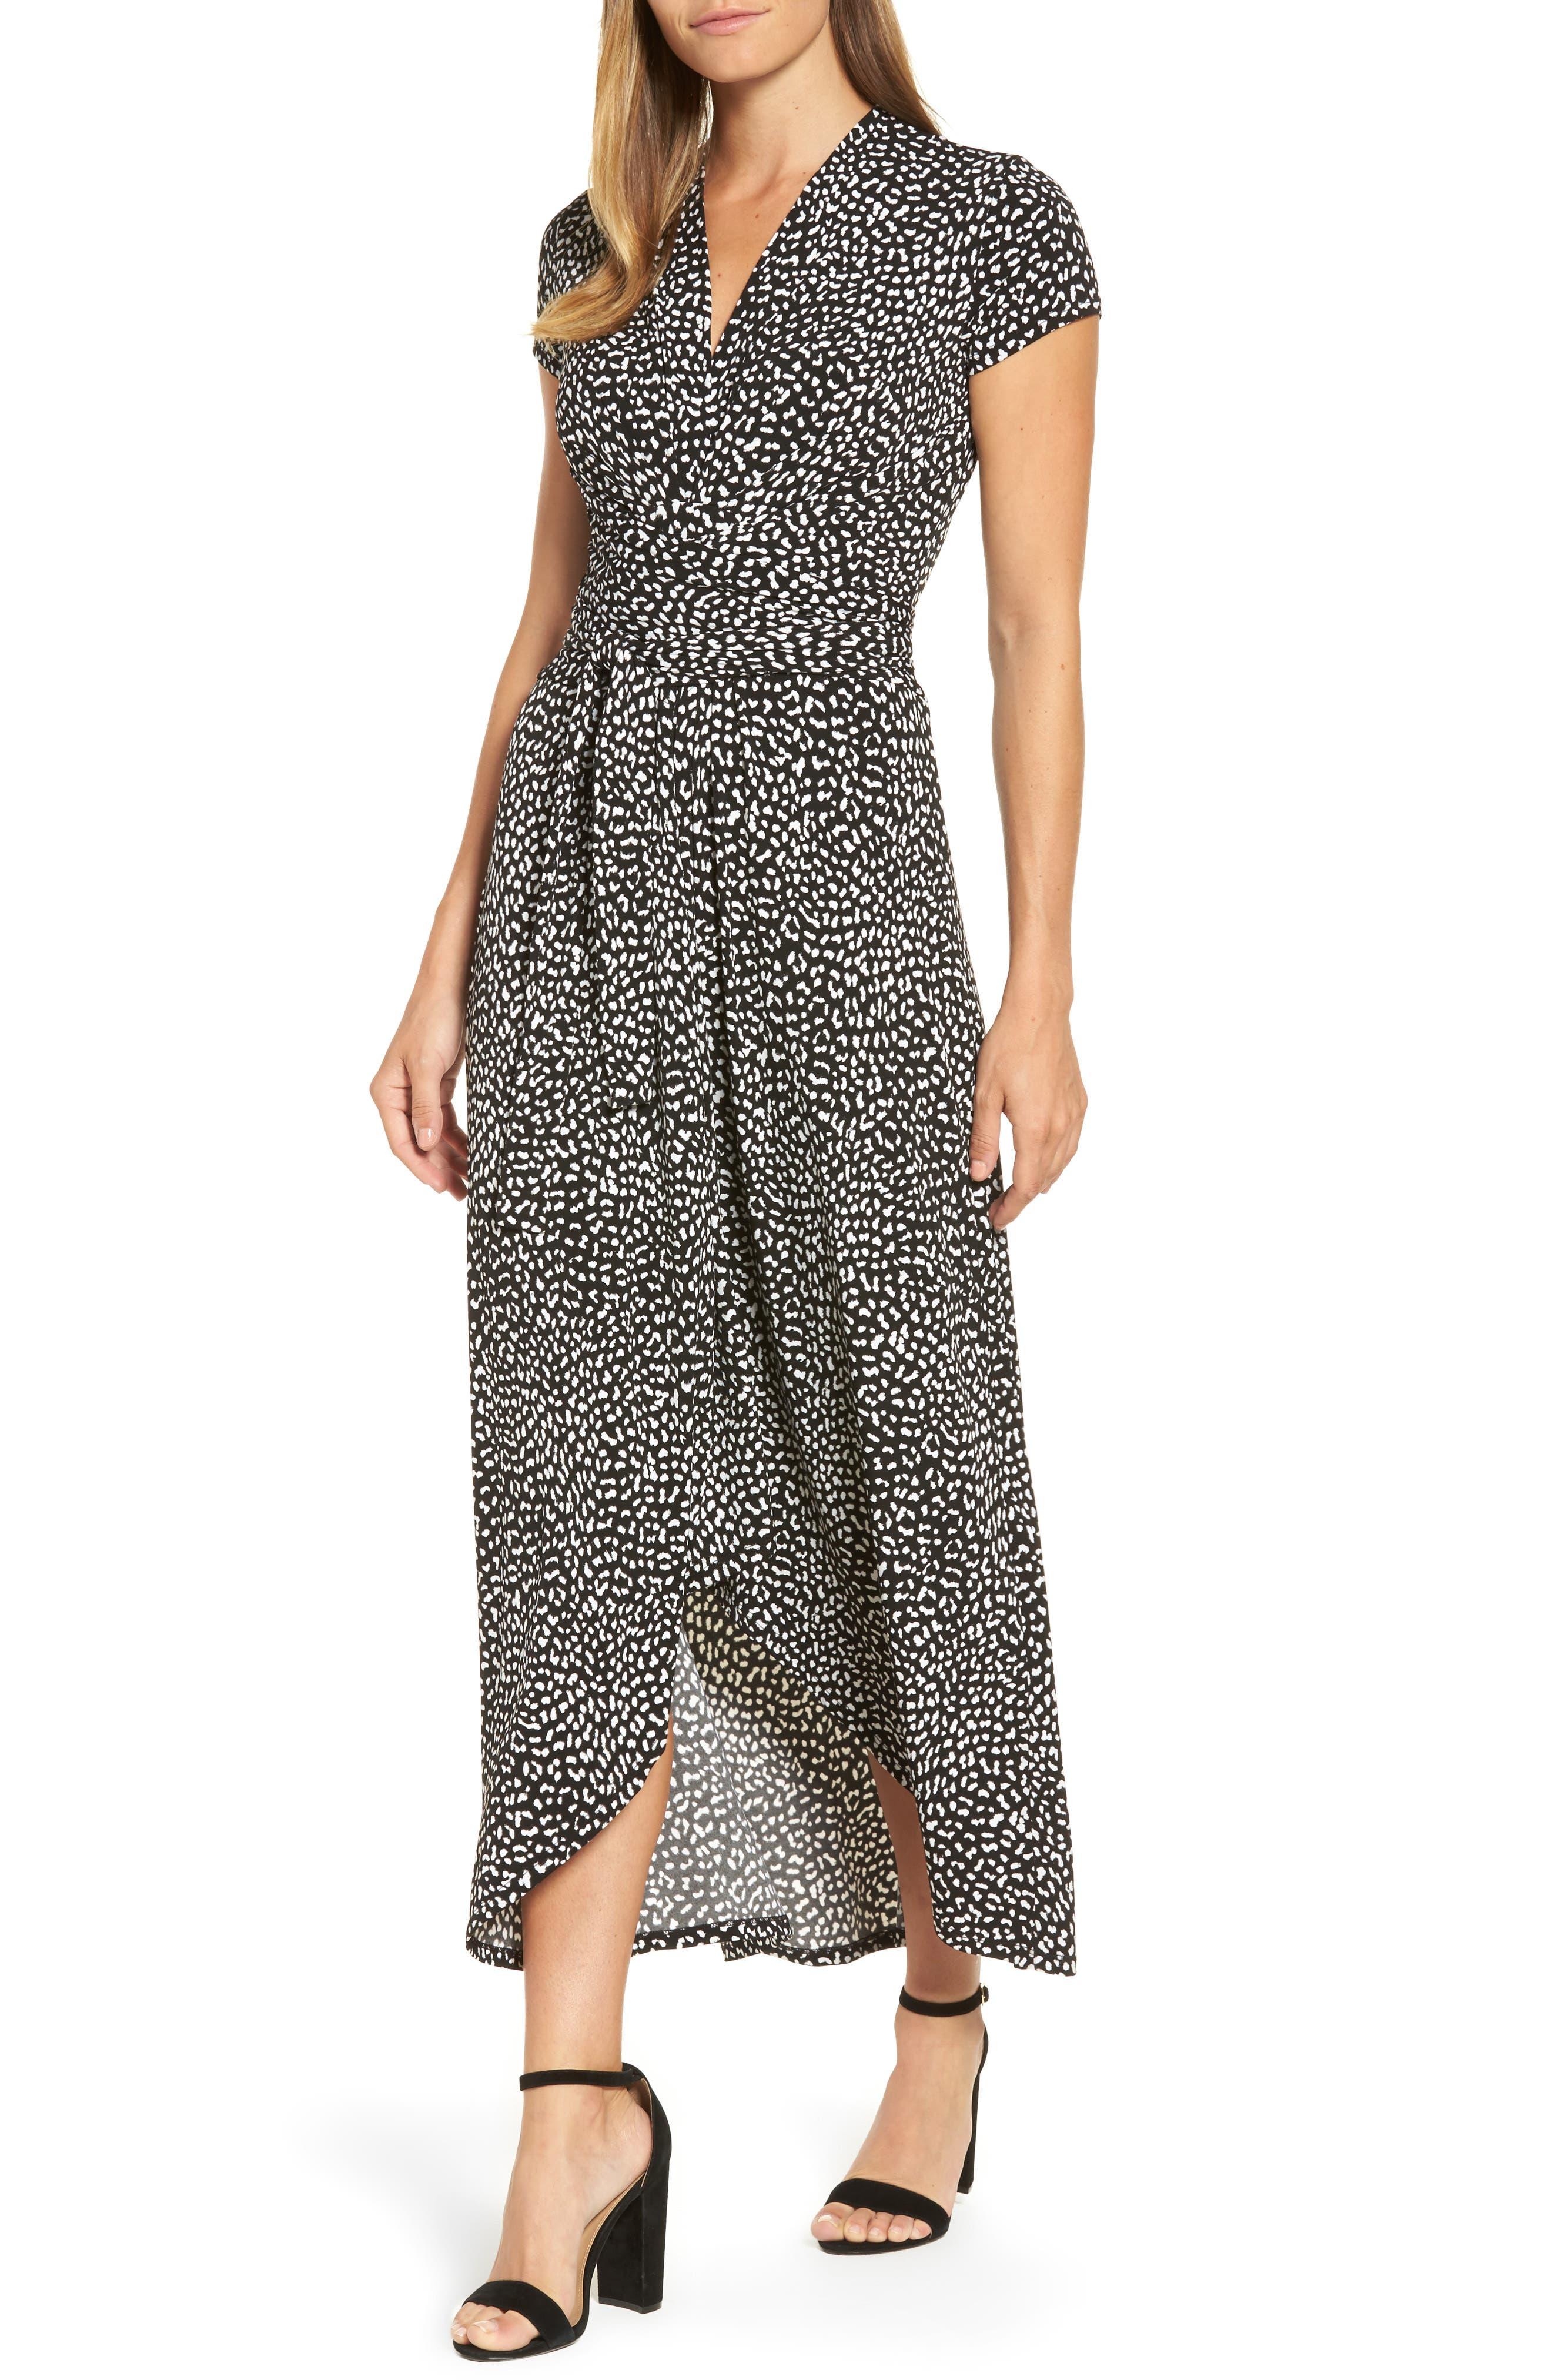 MICHAEL Michael Kors Cheetah Print Maxi Dress